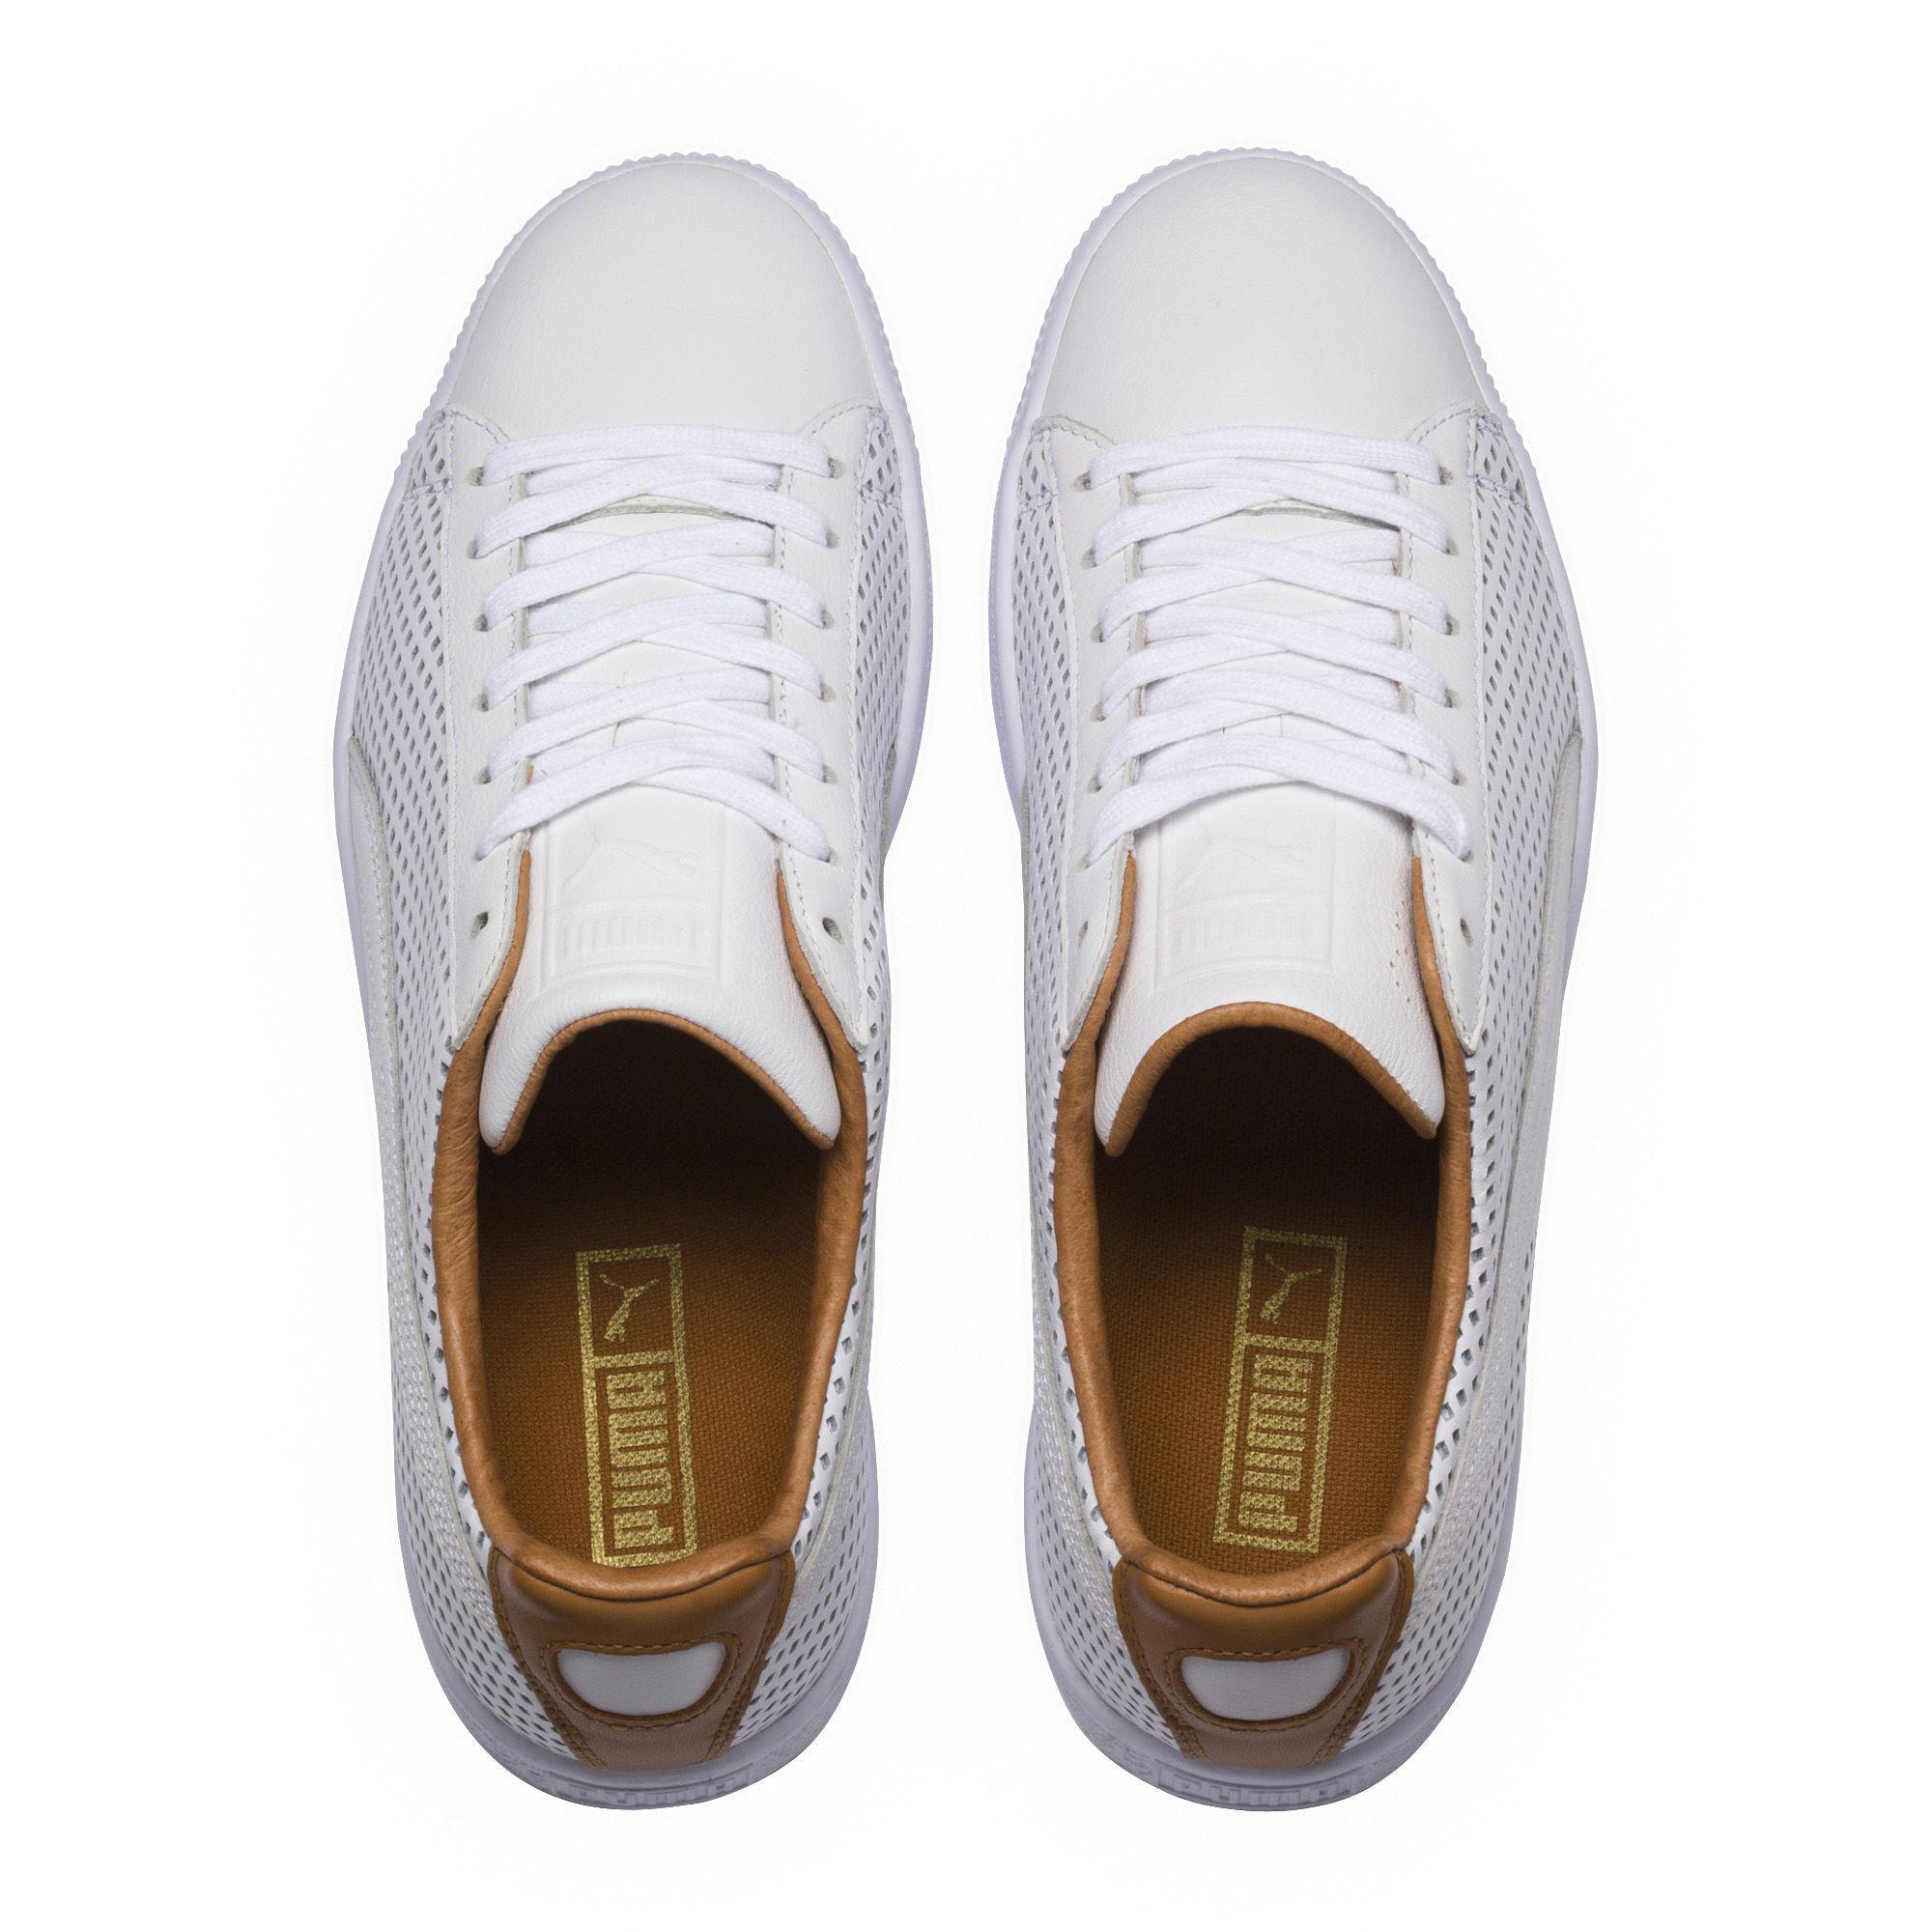 eef0bdd66d PUMA White Clyde Colorblock 2 Sneakers